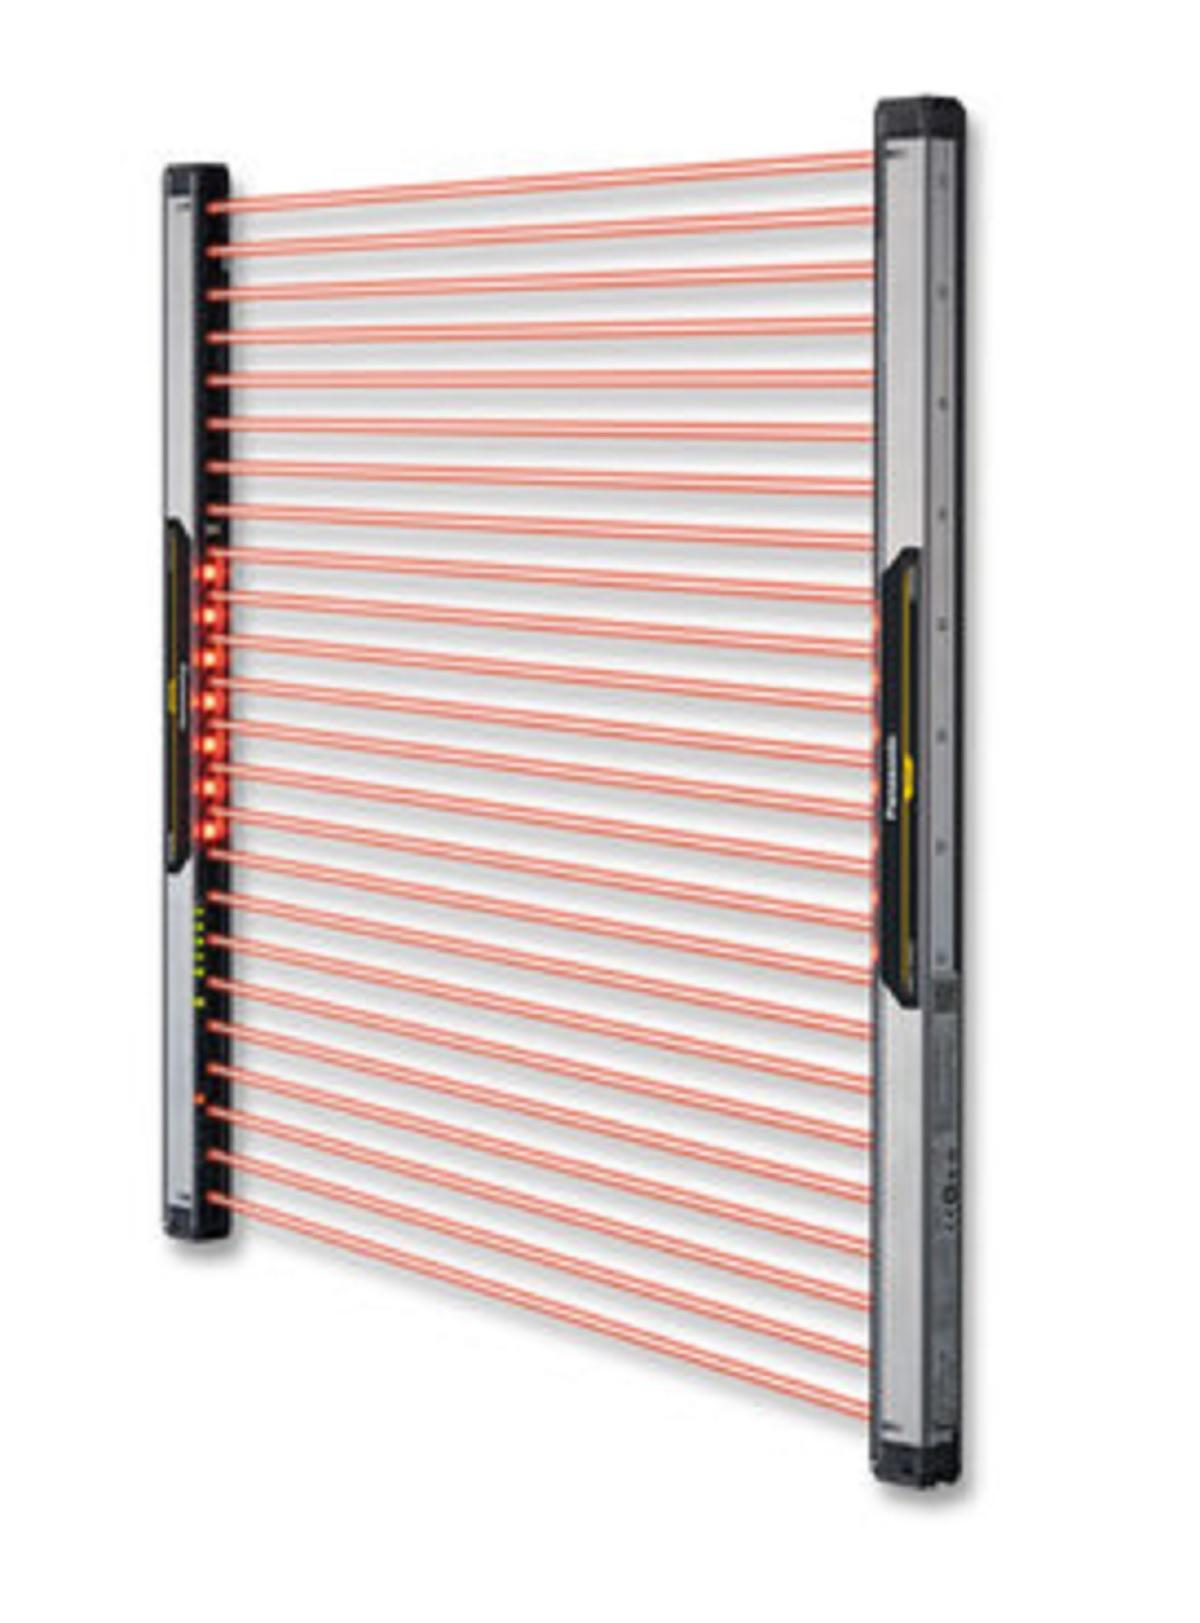 Panasonic / SUNX SF4B-C SERIES ม่านแสงนิรภัย มาตรฐานความปลอดภัย ระดับ 4